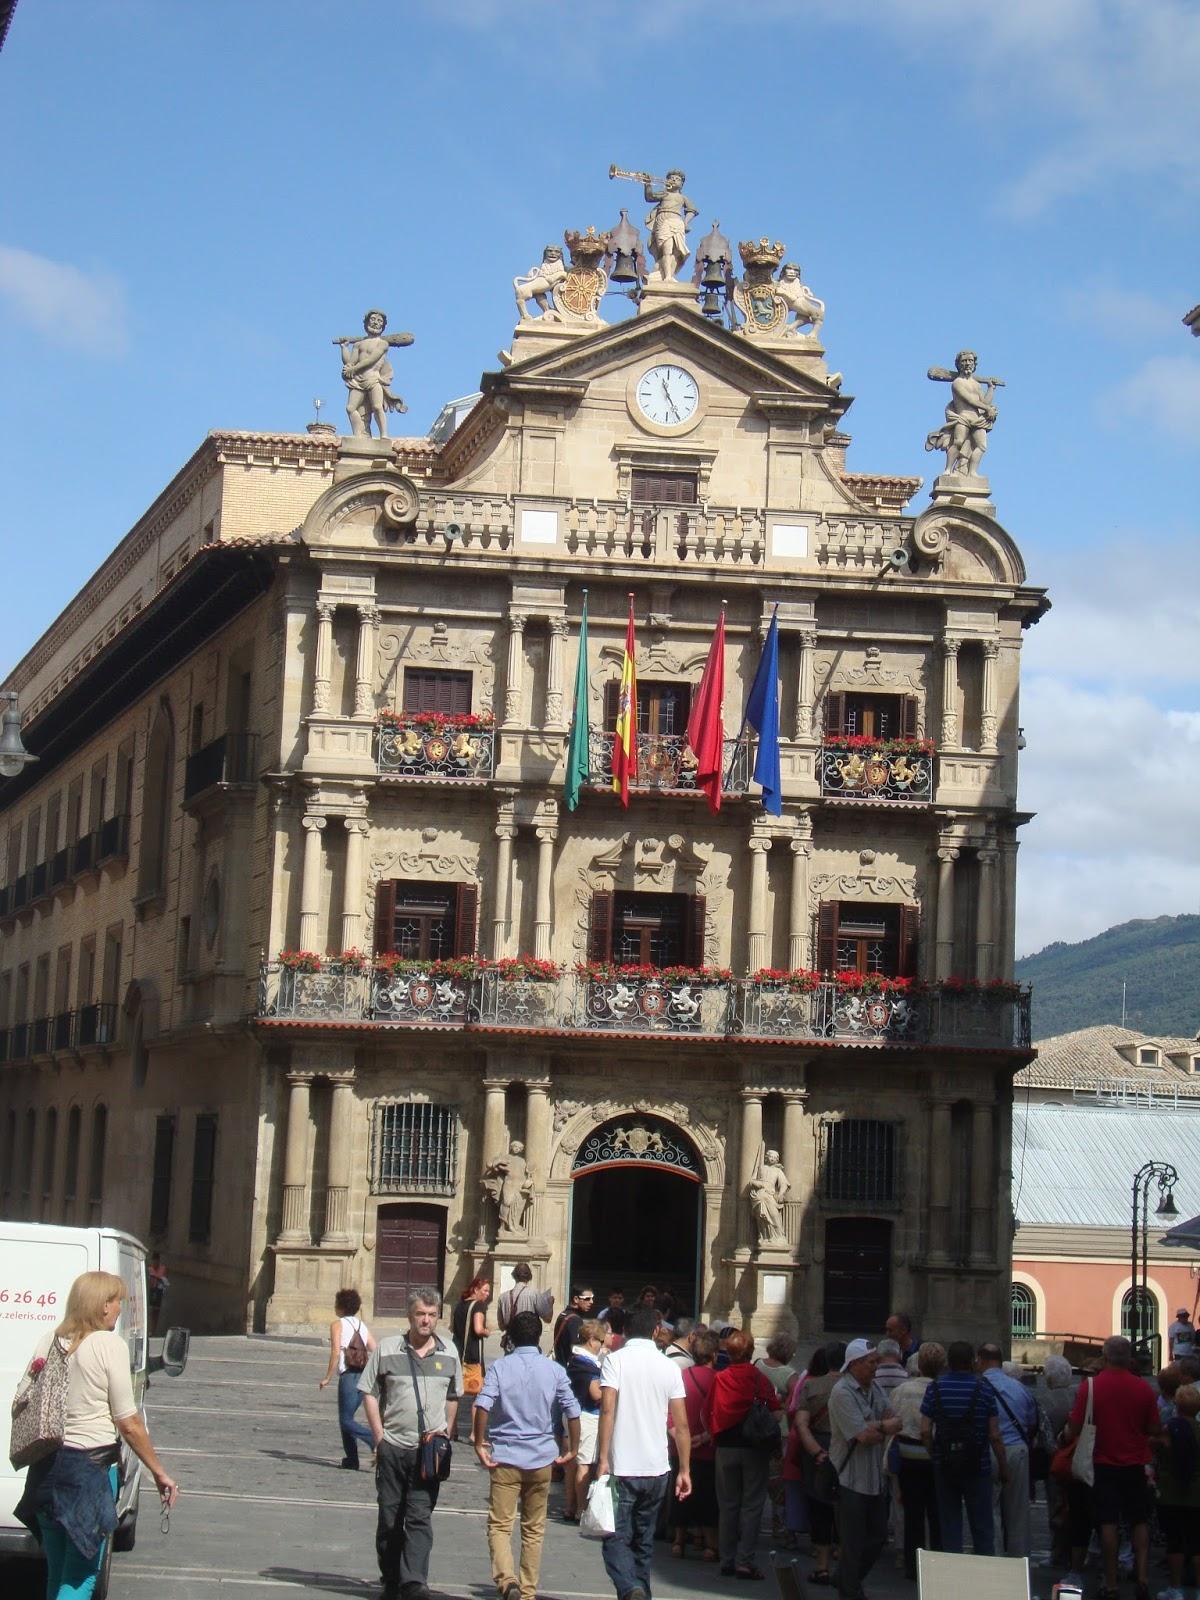 Fim de navarra e inicio dos pireneus kasaskostas - Pamplona centro historico ...